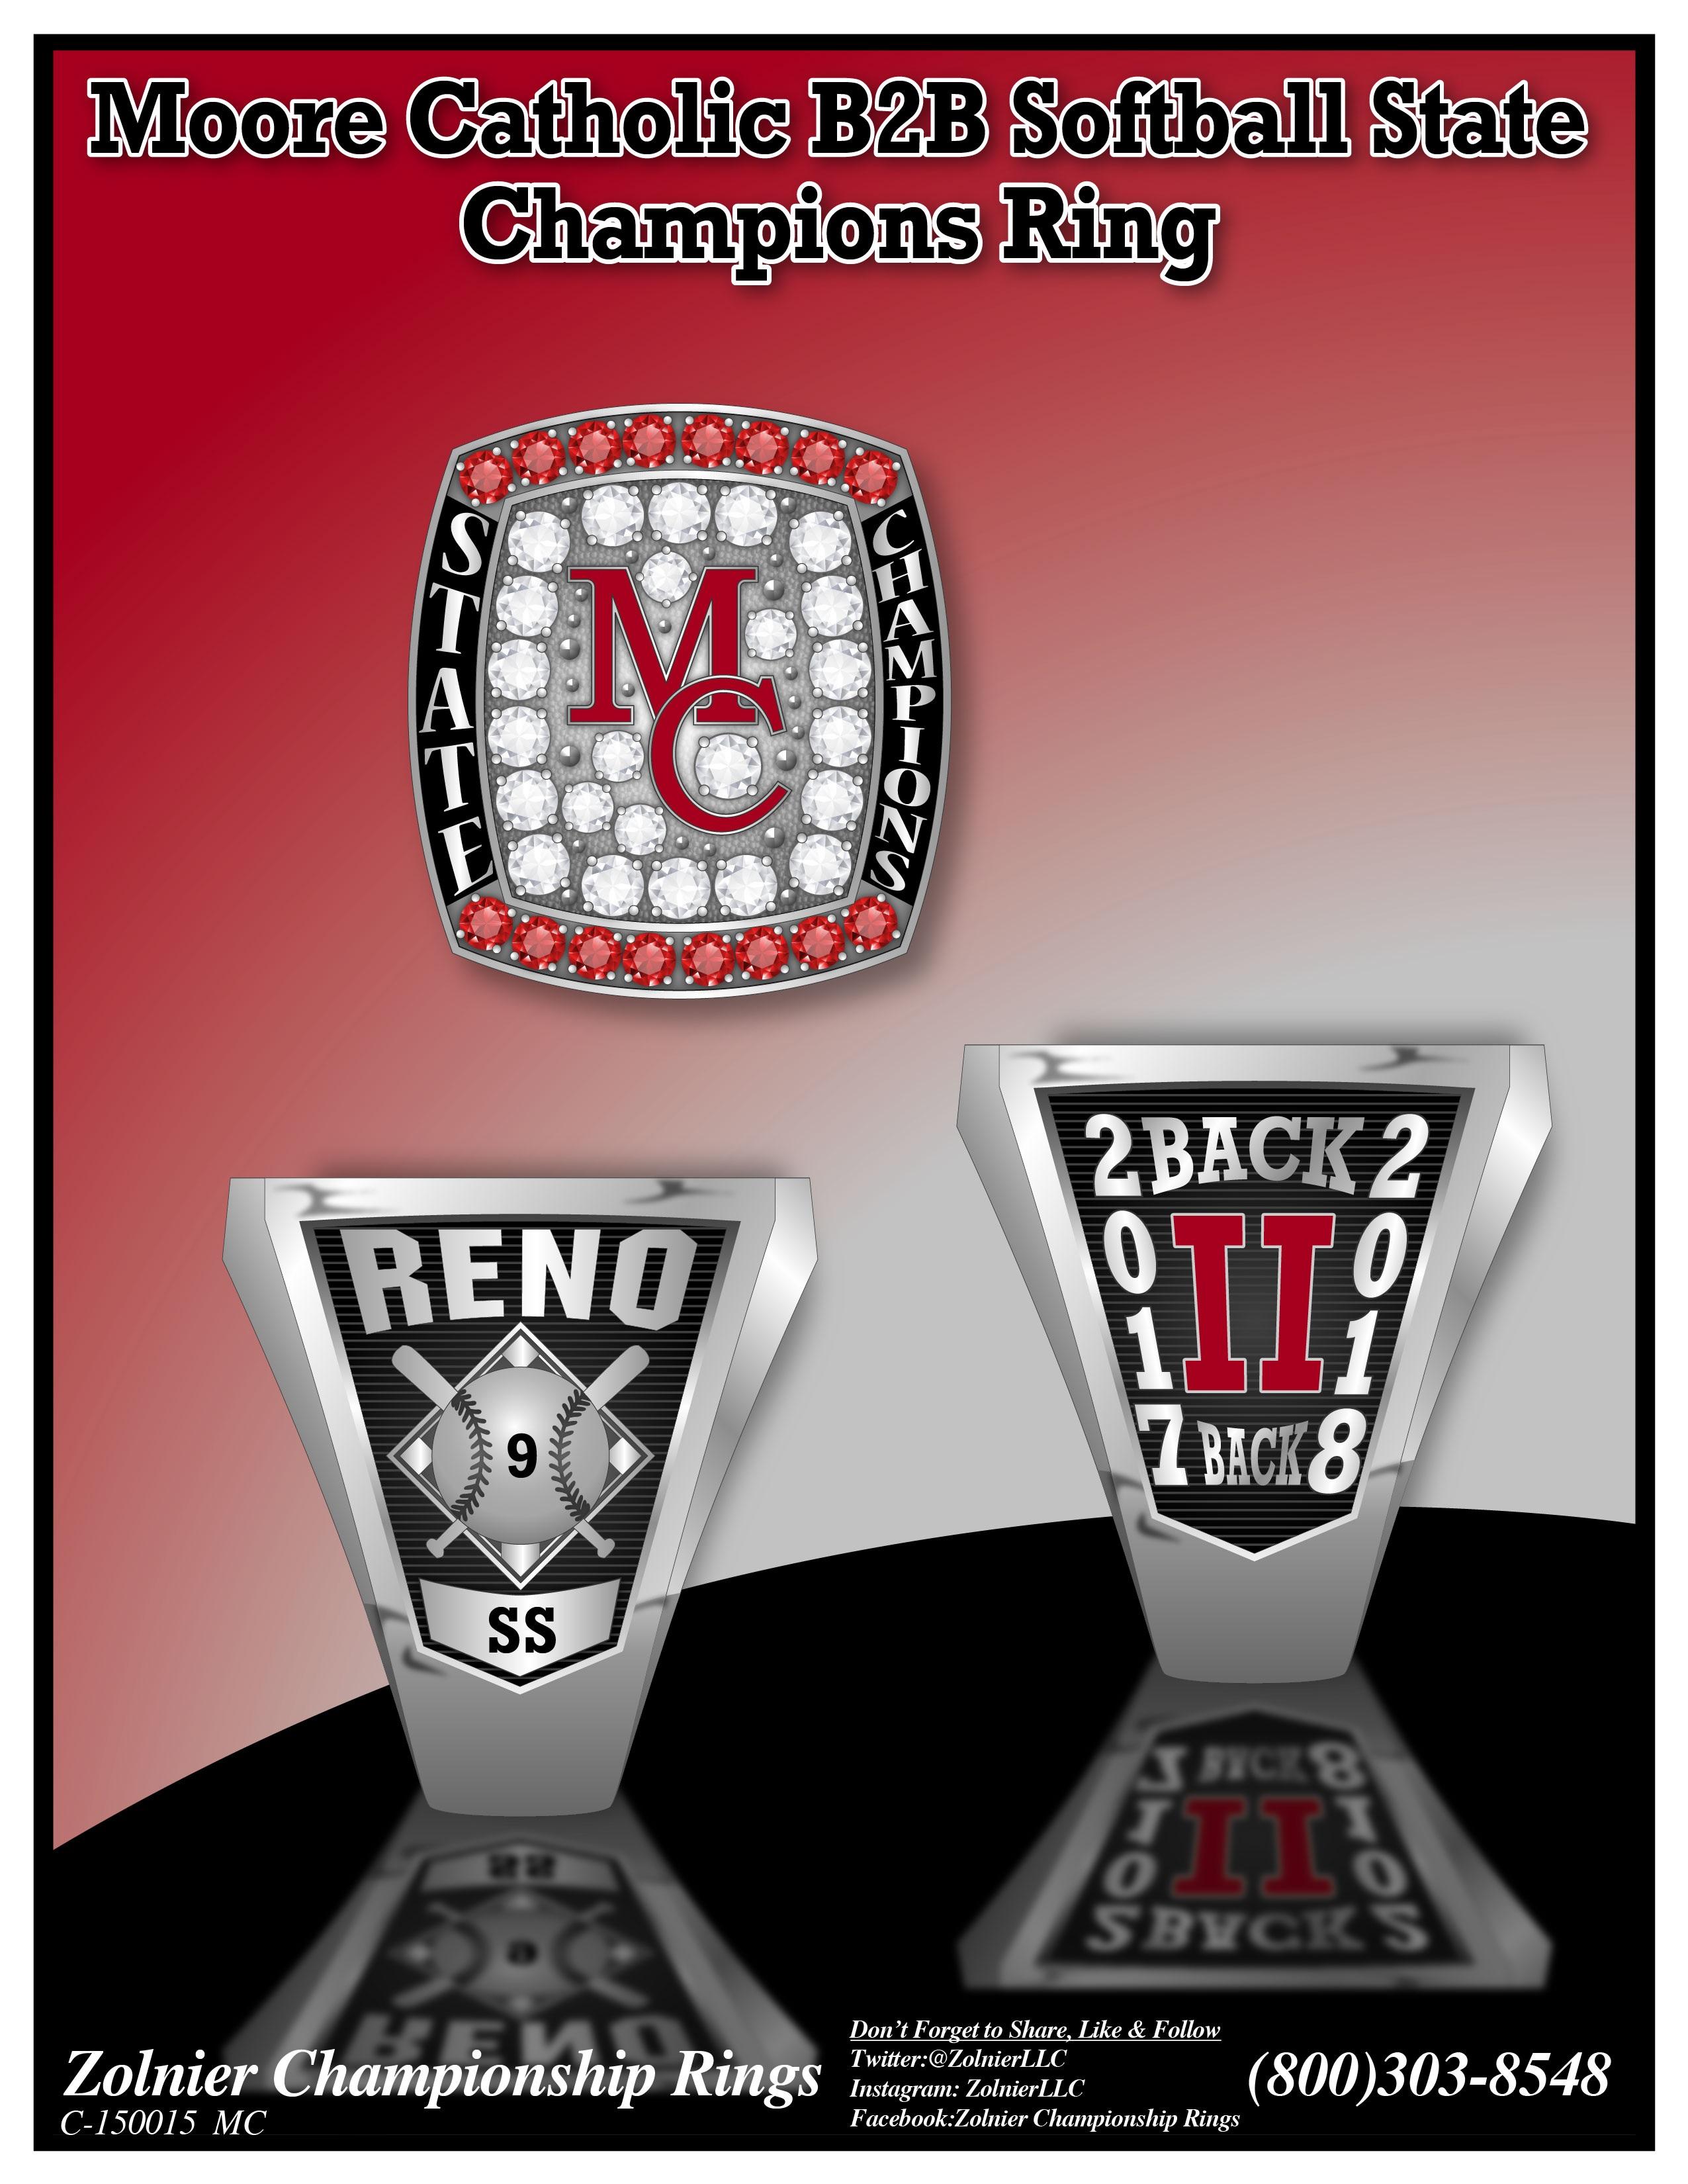 C-150015 Moore Catholic HS Softball B2B Champ Ring